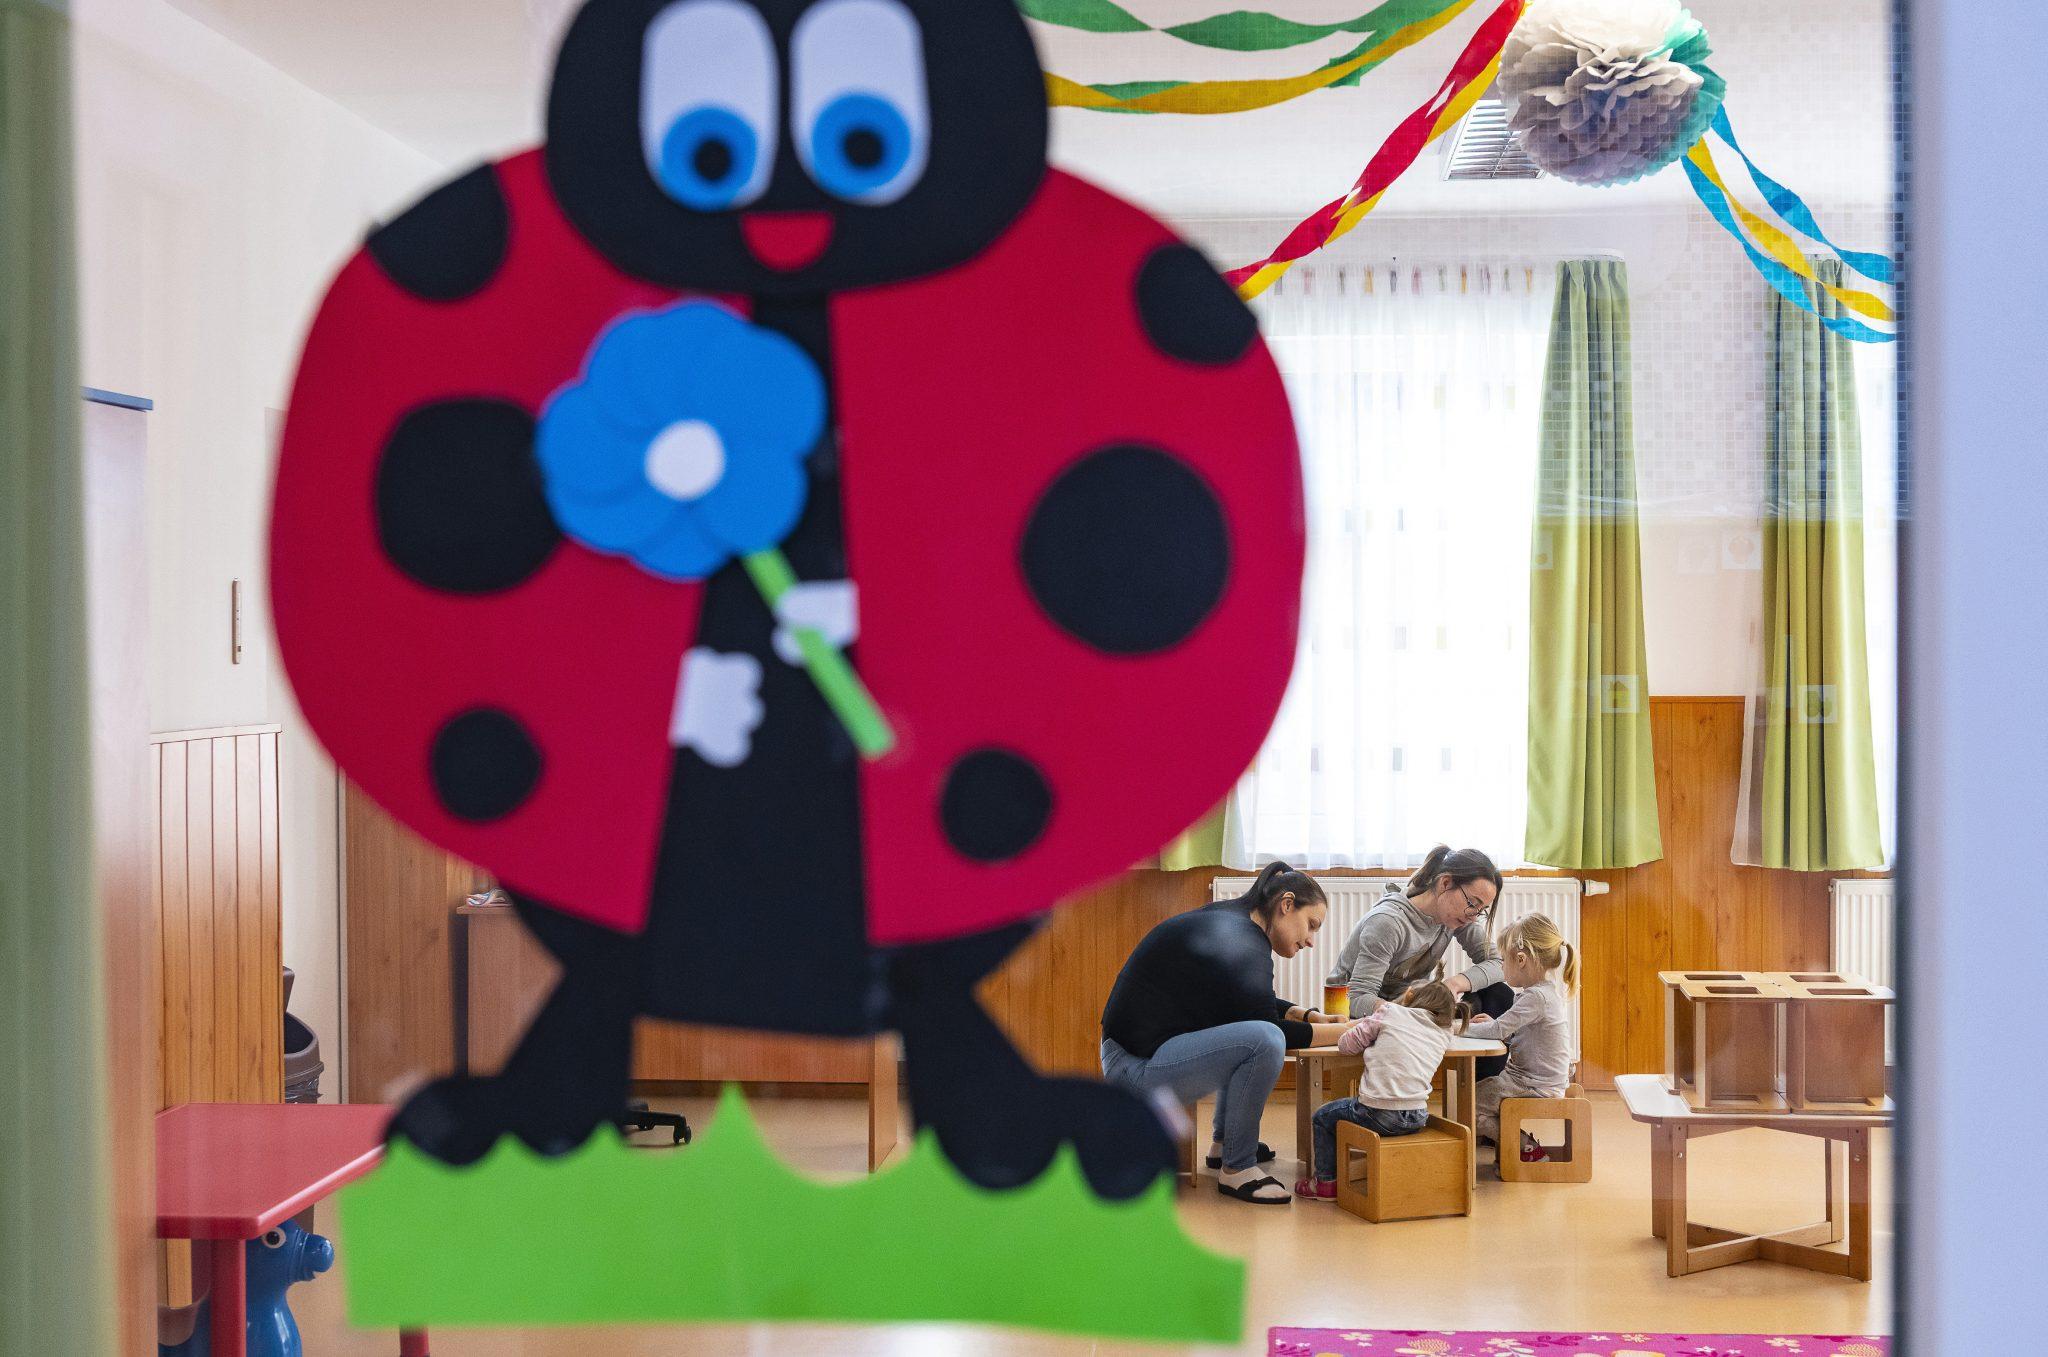 English-language Kindergartens in Danger?